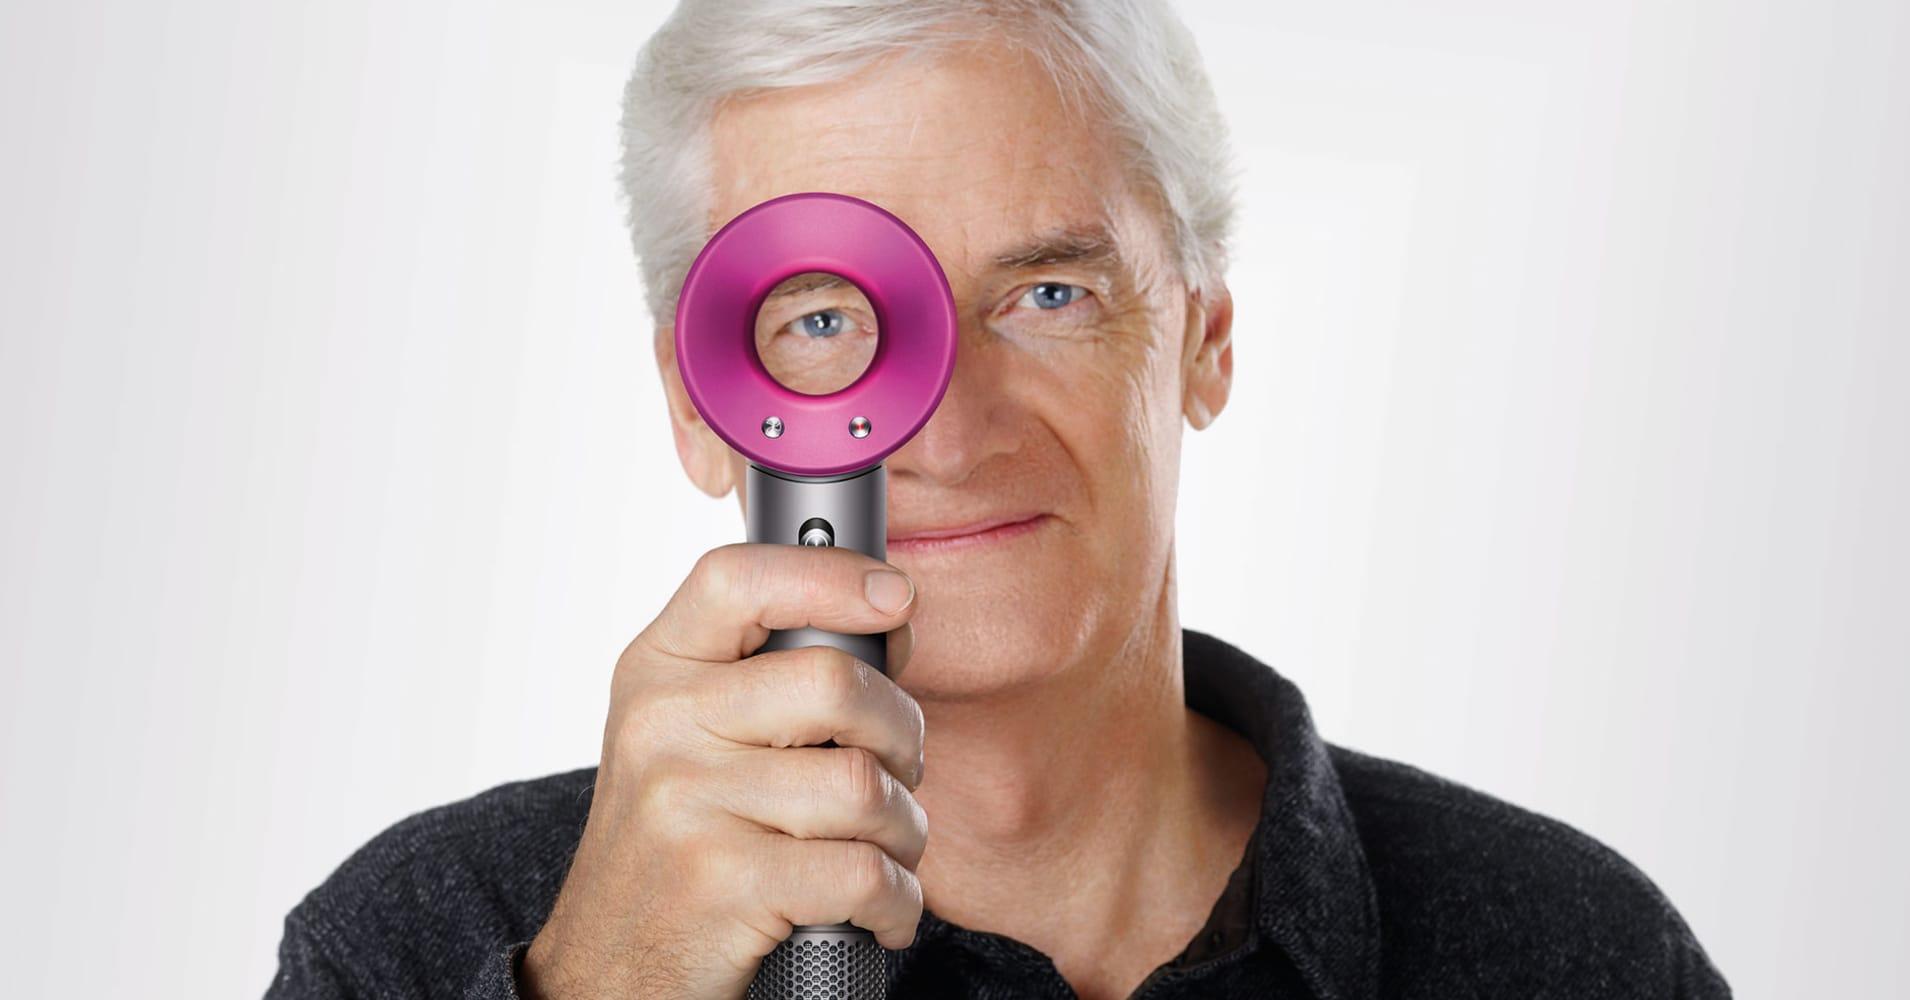 Vacuum Brand Dyson Unveils Its First Quieter 400 Hair Dryer